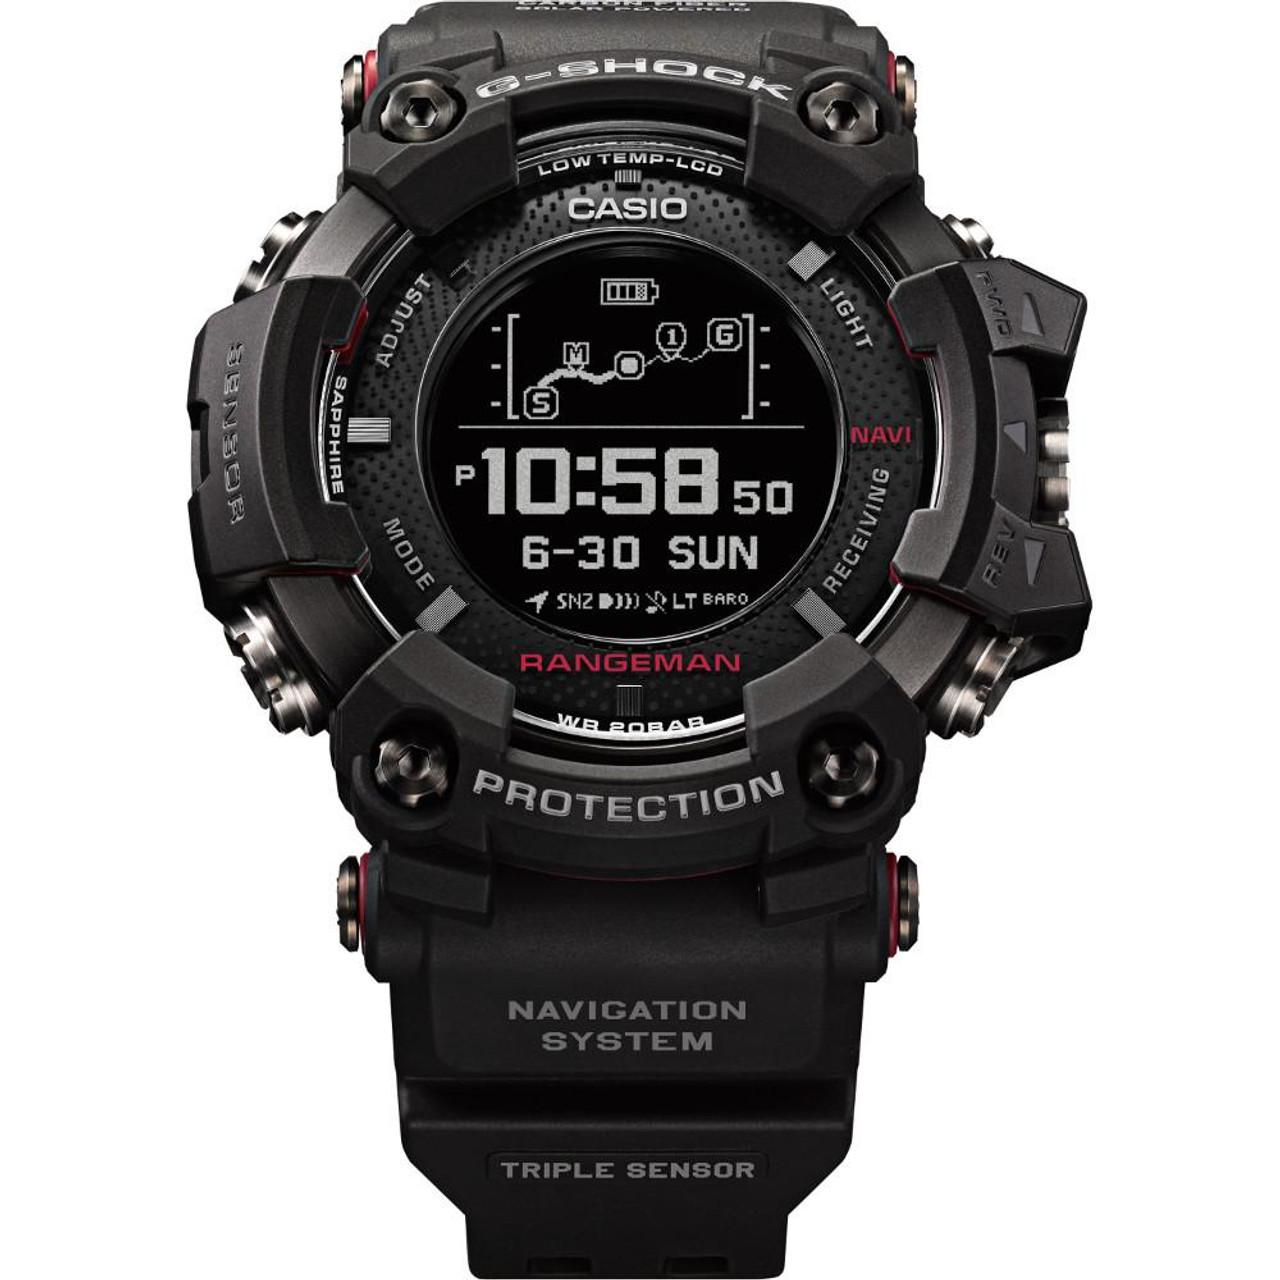 62b621e5ba G-Shock Rangeman GPS Navigation Bluetooth Triple Sensor Solar Watch  GPR-B1000-1ER